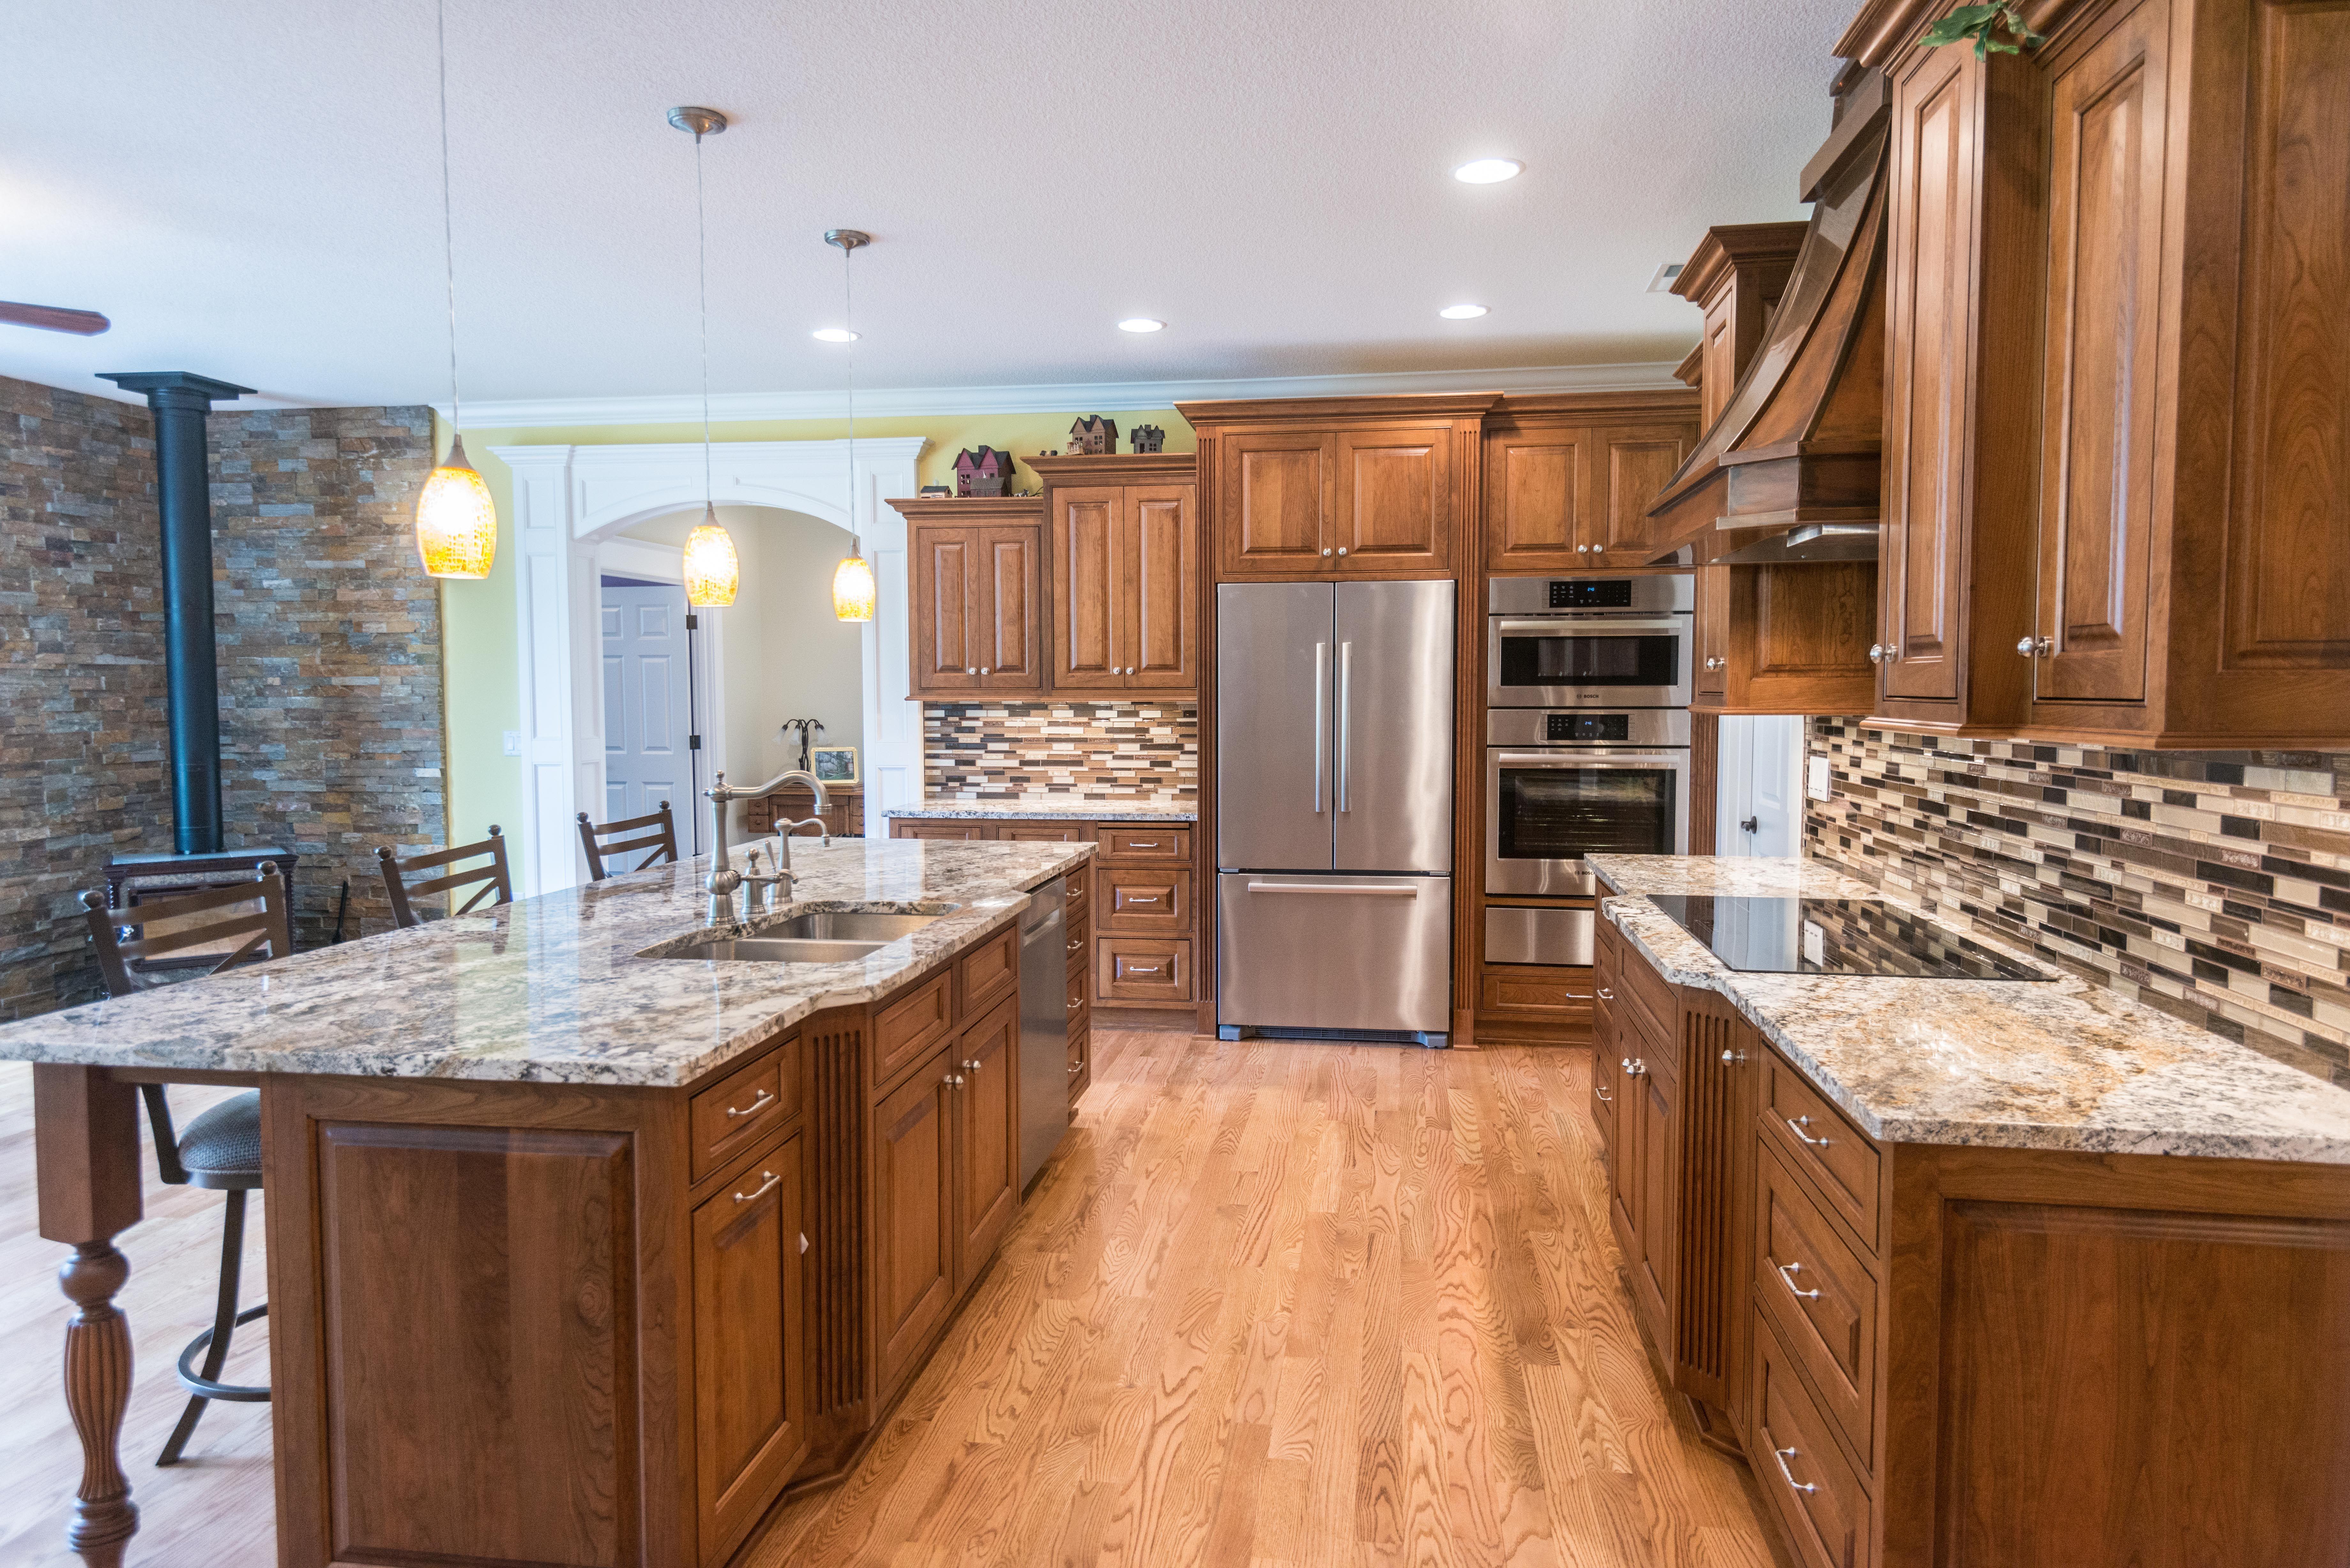 Dewils kitchen designed by act builders in